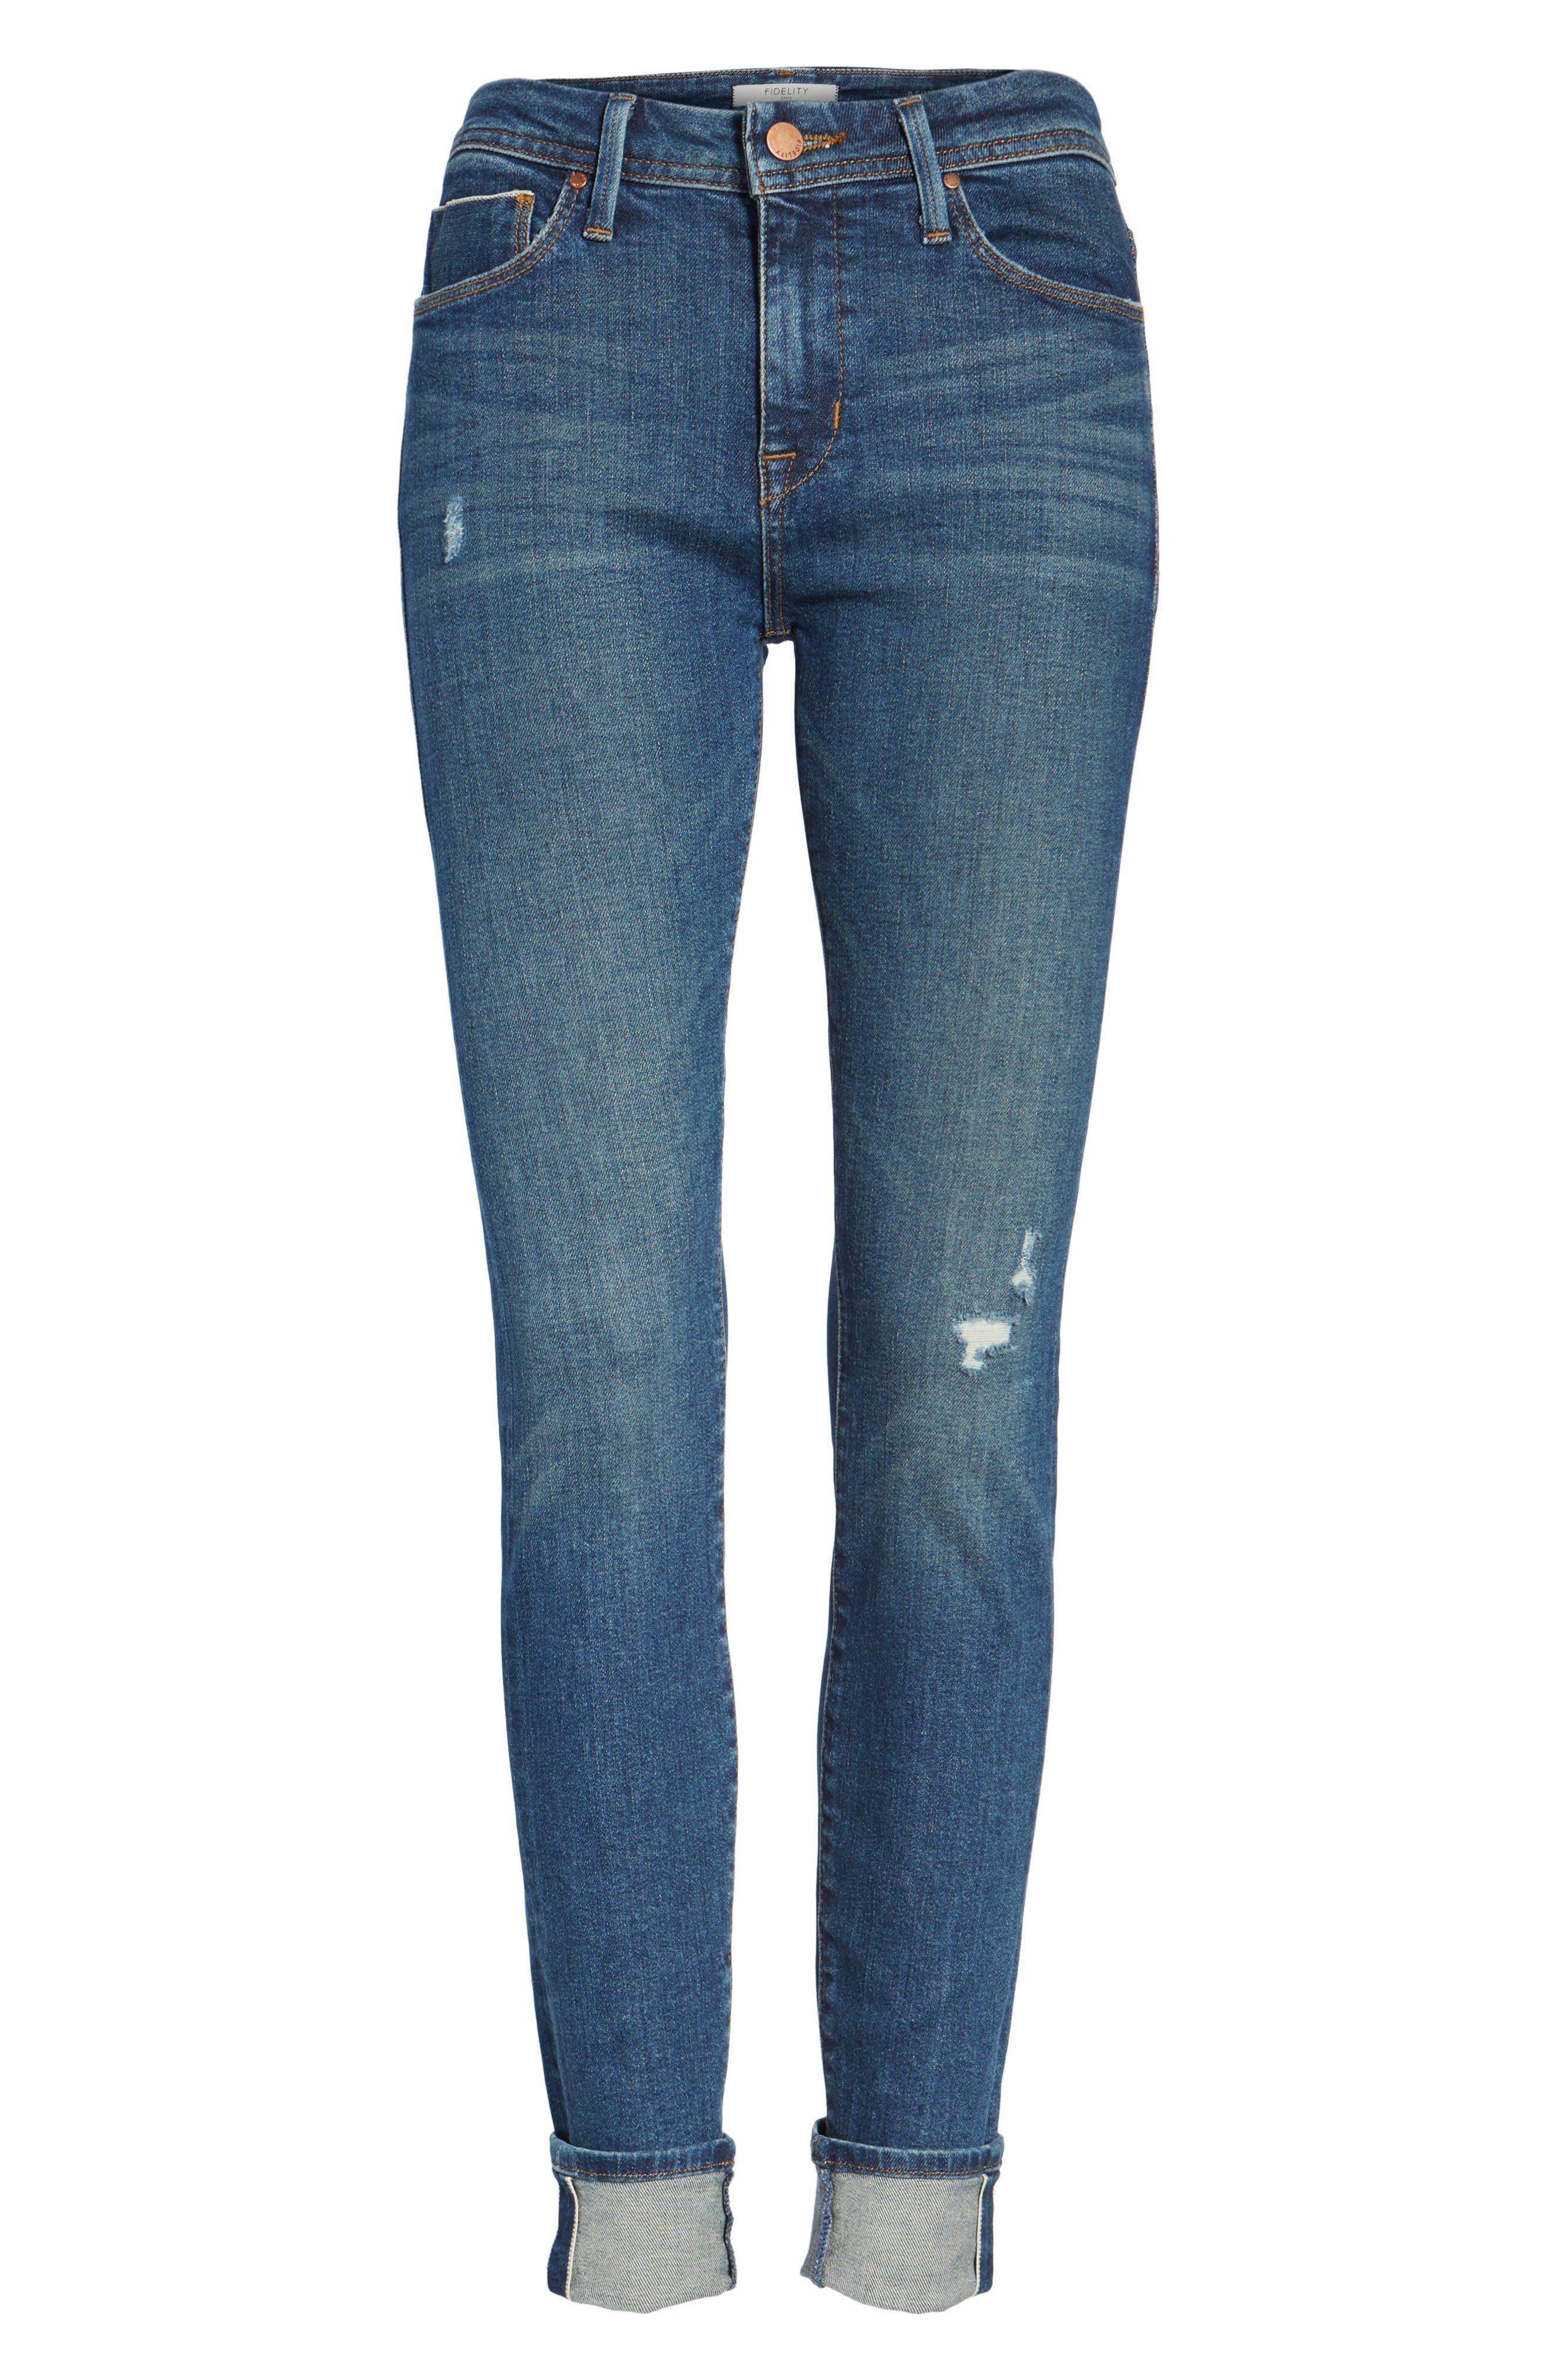 Belvedere Crop Skinny Jeans,                             Alternate thumbnail 6, color,